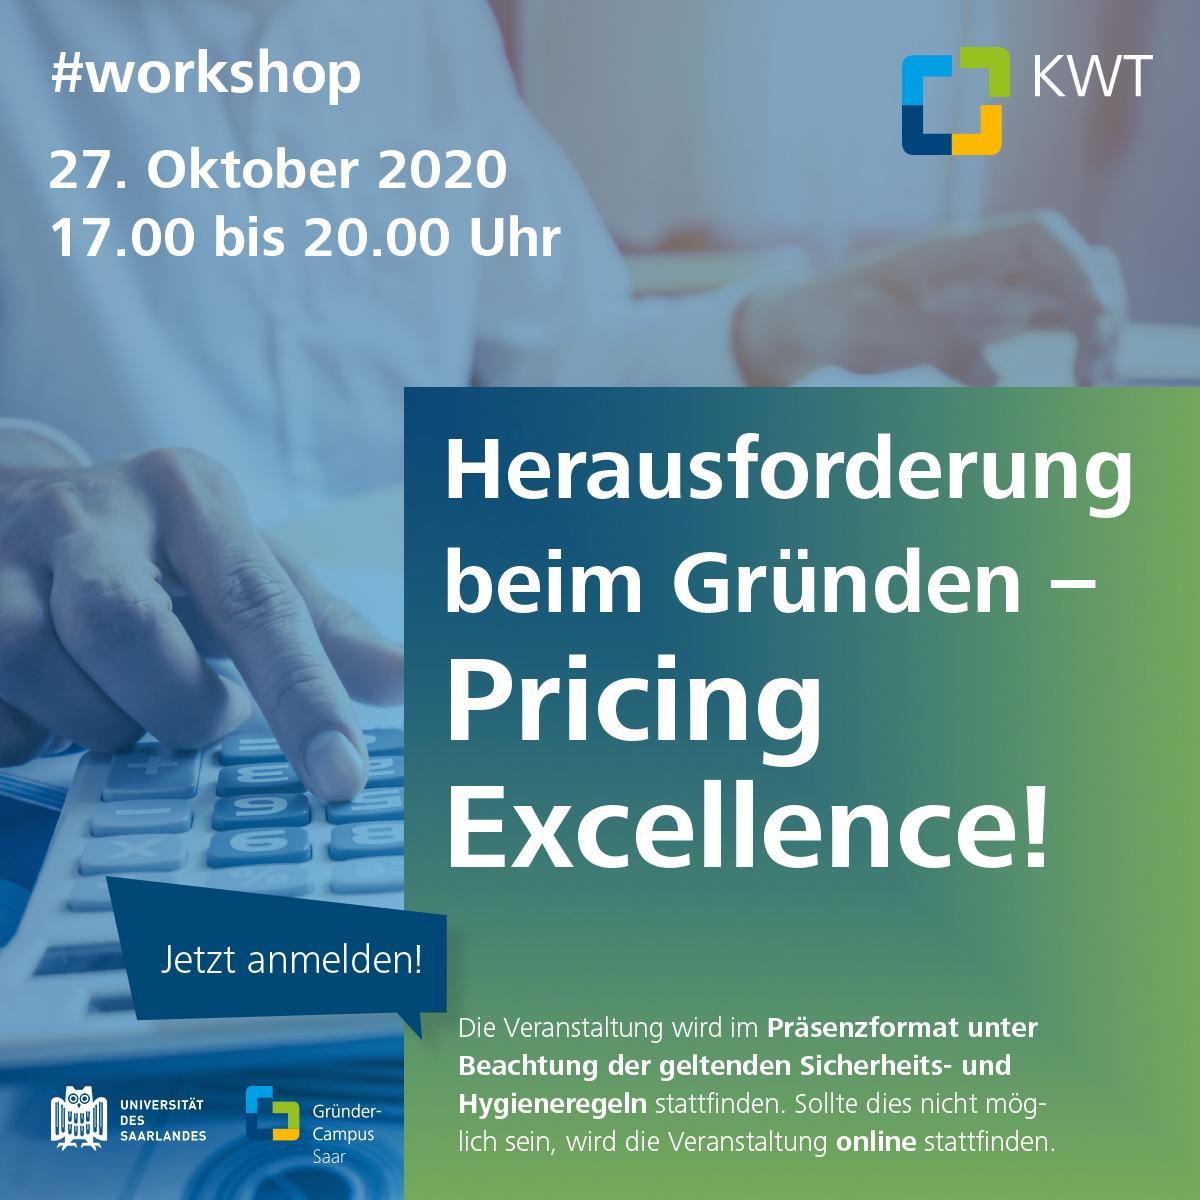 Workshop Pricing Excellence